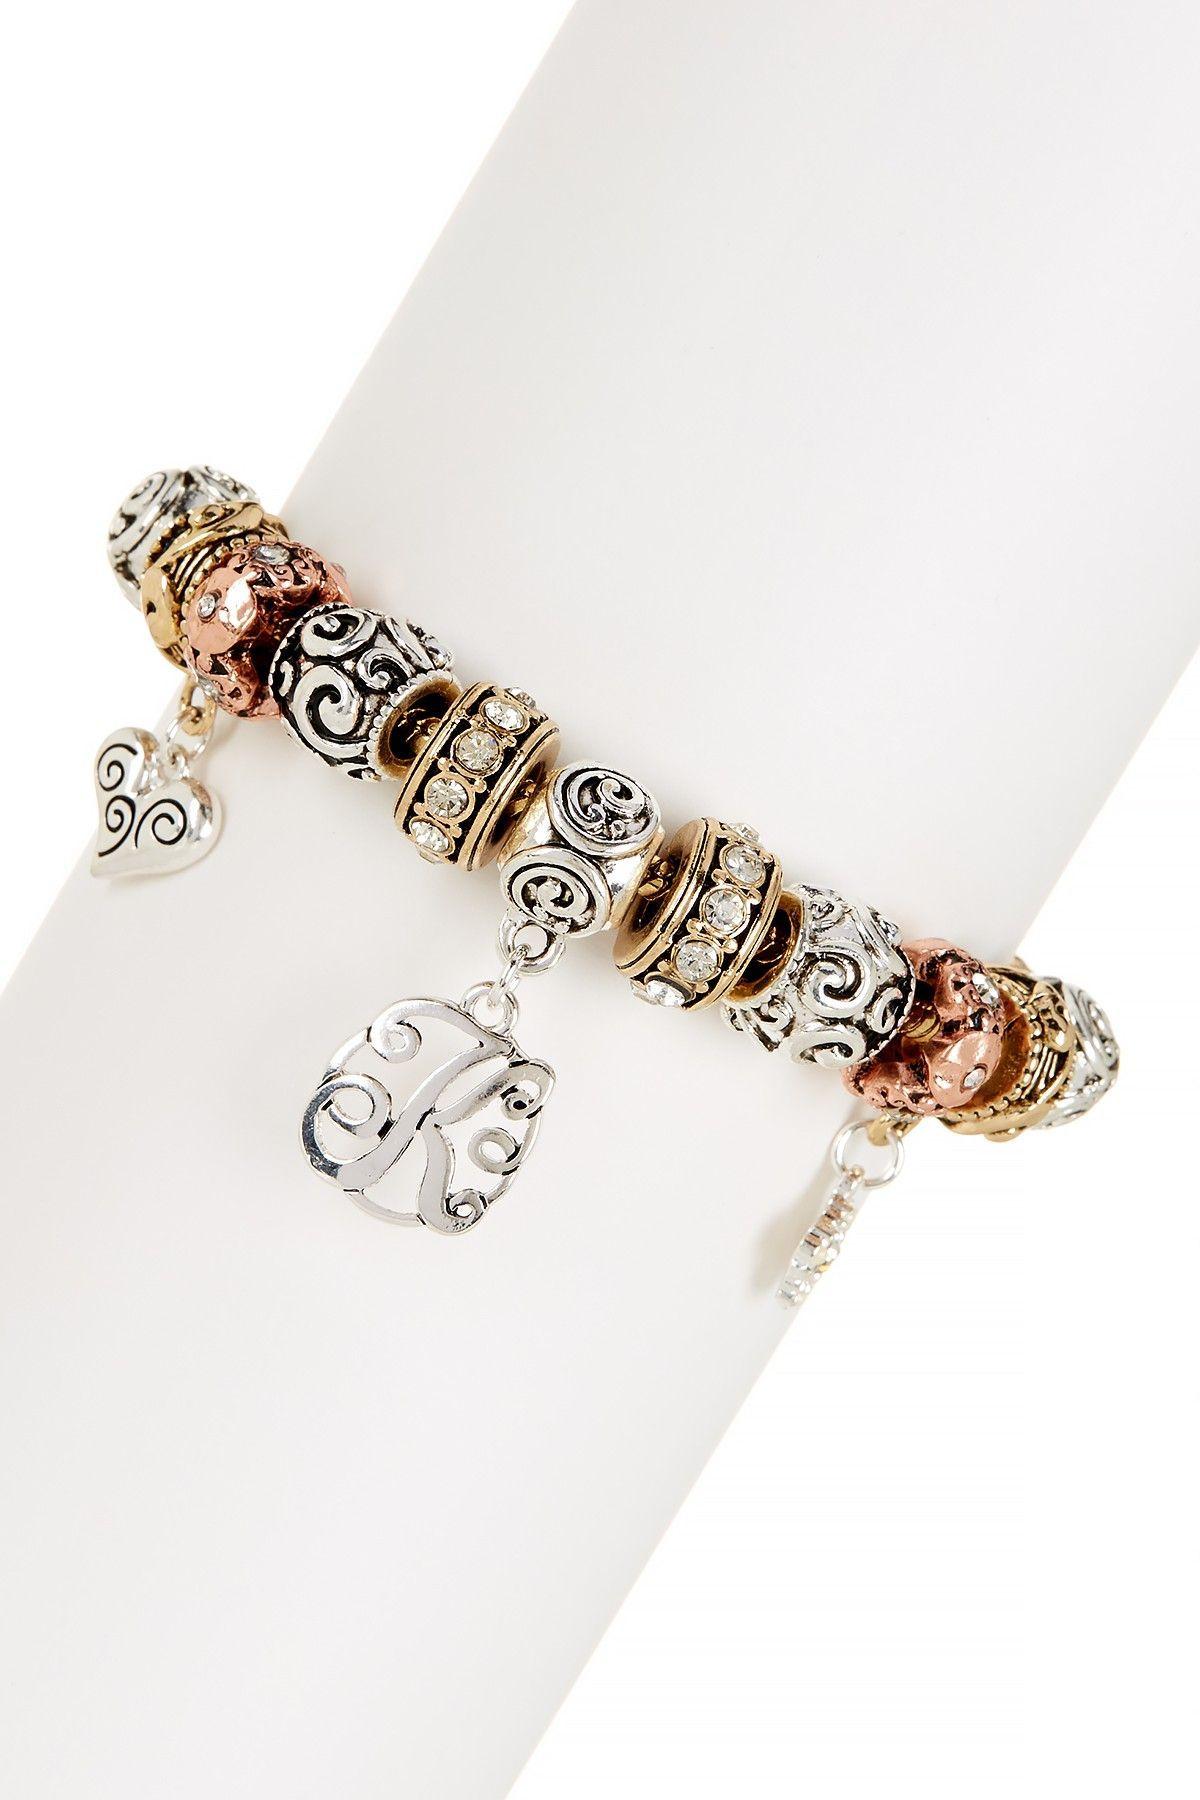 Monogram Initial Bead Bracelet - Letters K-T Available